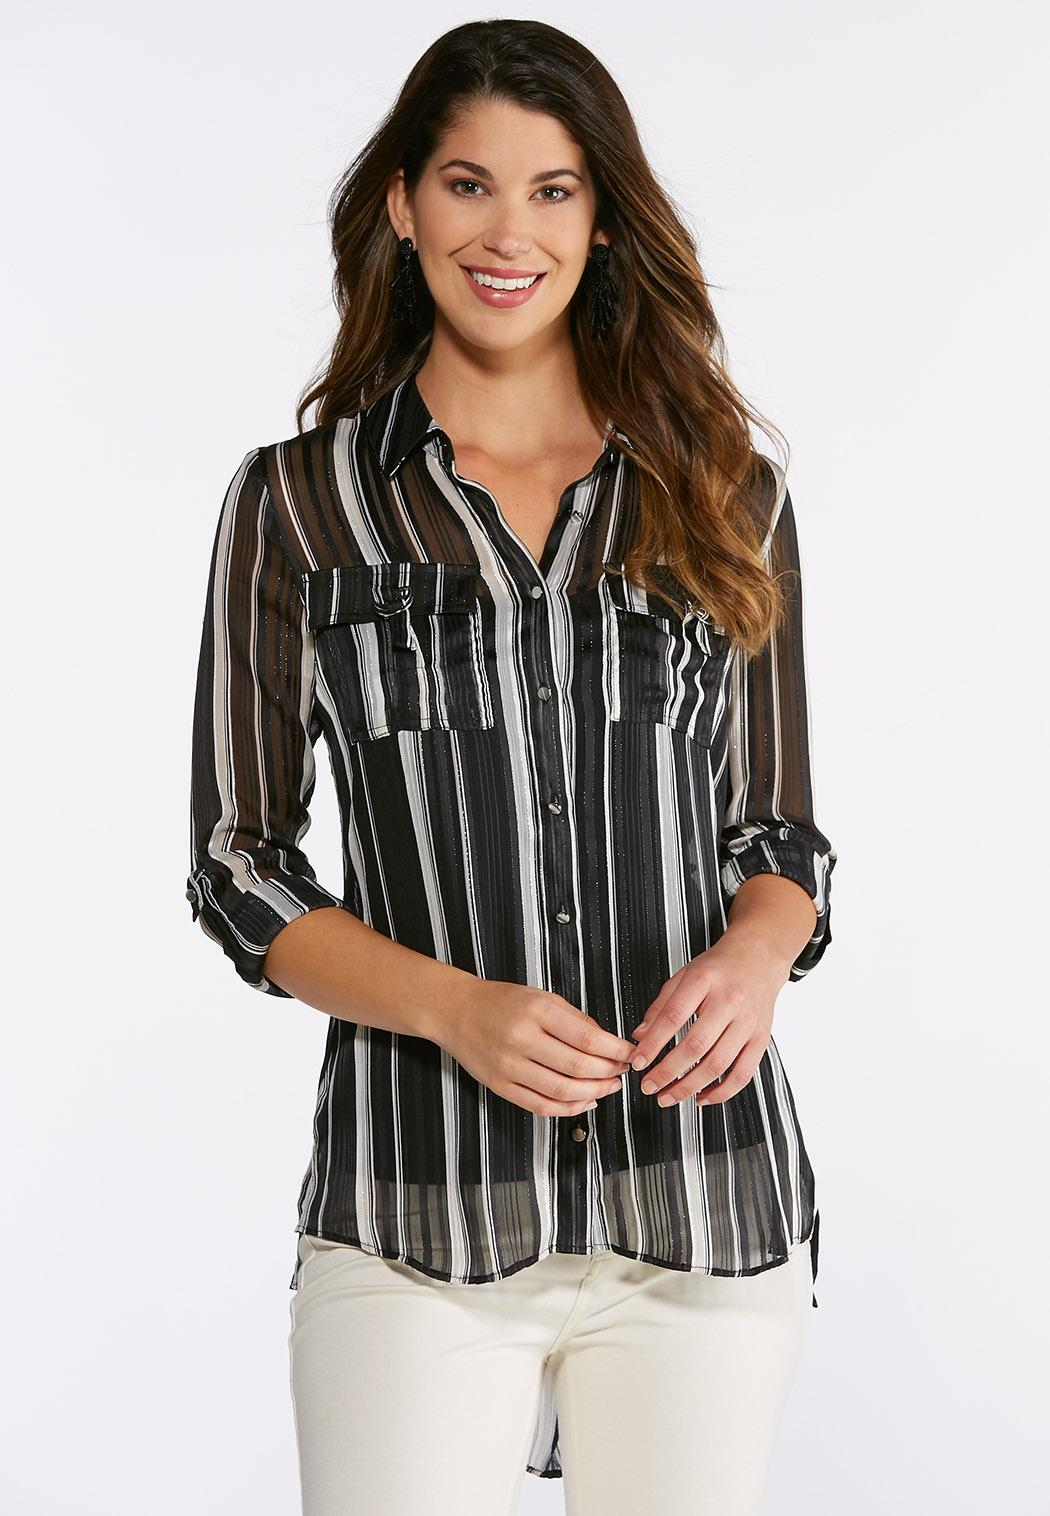 Plus Size Metallic Stripe Top Shirts Blouses Cato Fashions